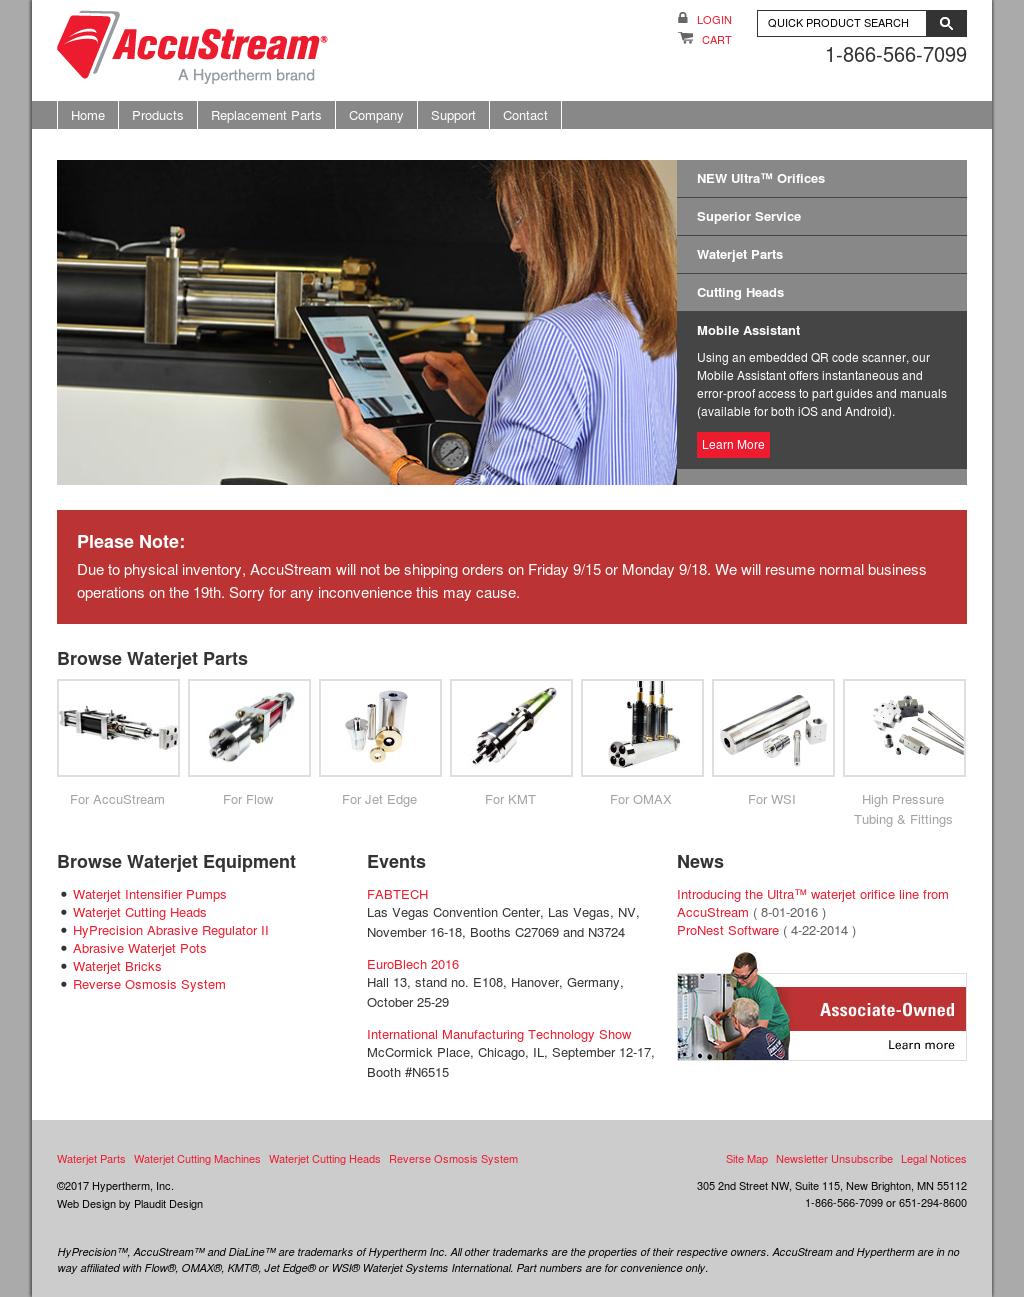 AccuStream Competitors, Revenue and Employees - Owler Company Profile